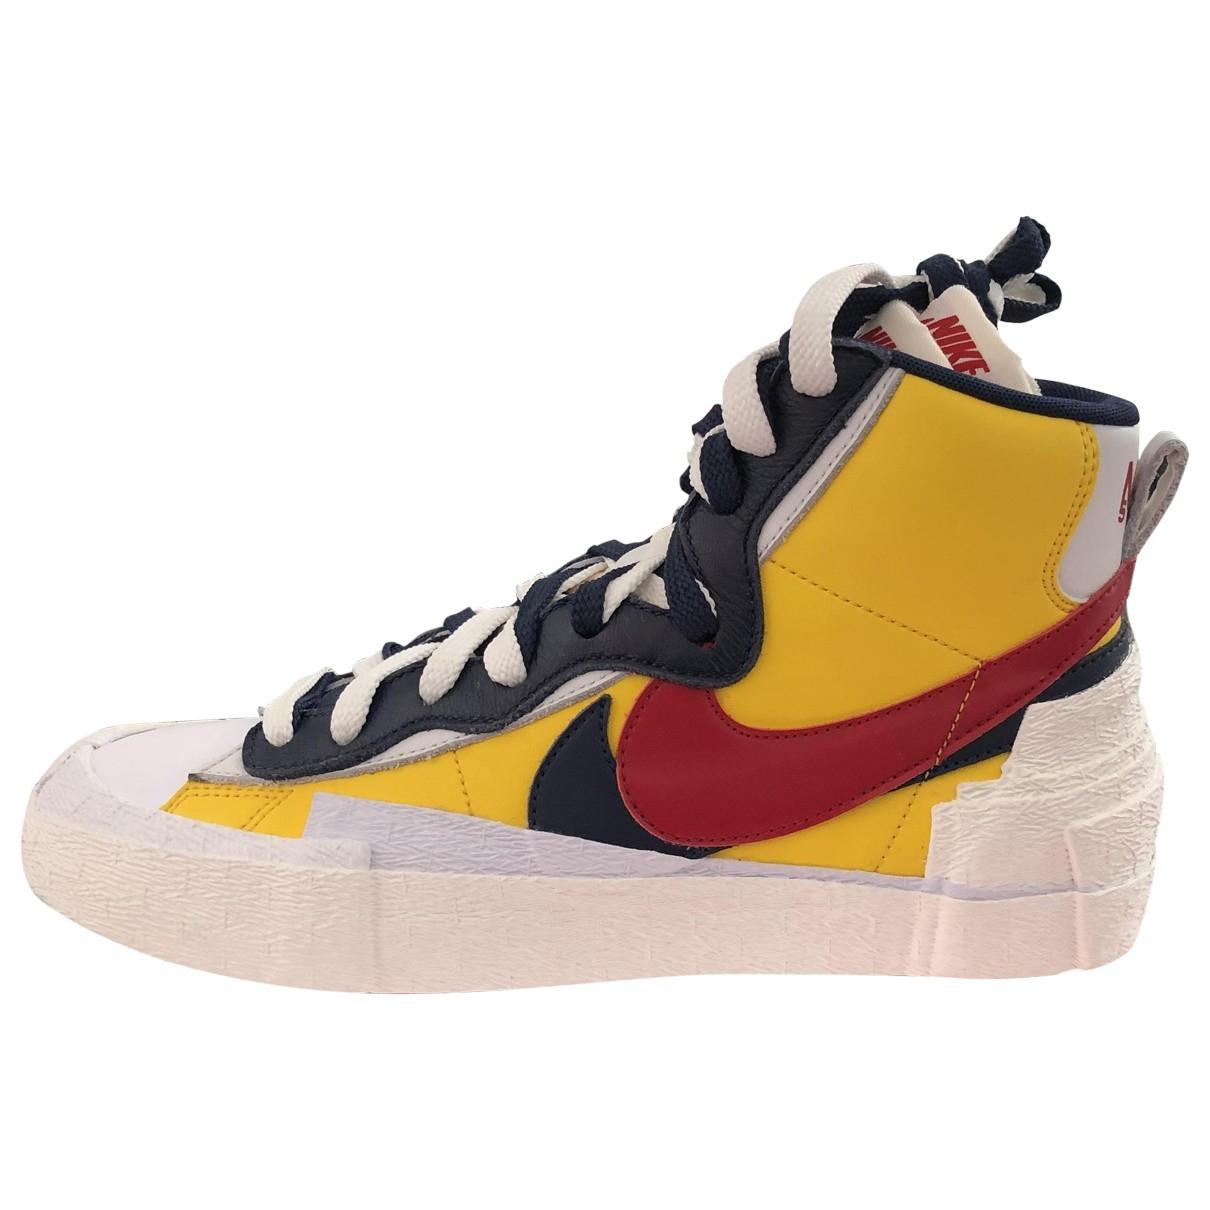 Nike X Sacaï Blazer Mid Yellow Cloth Trainers for Men 8 US